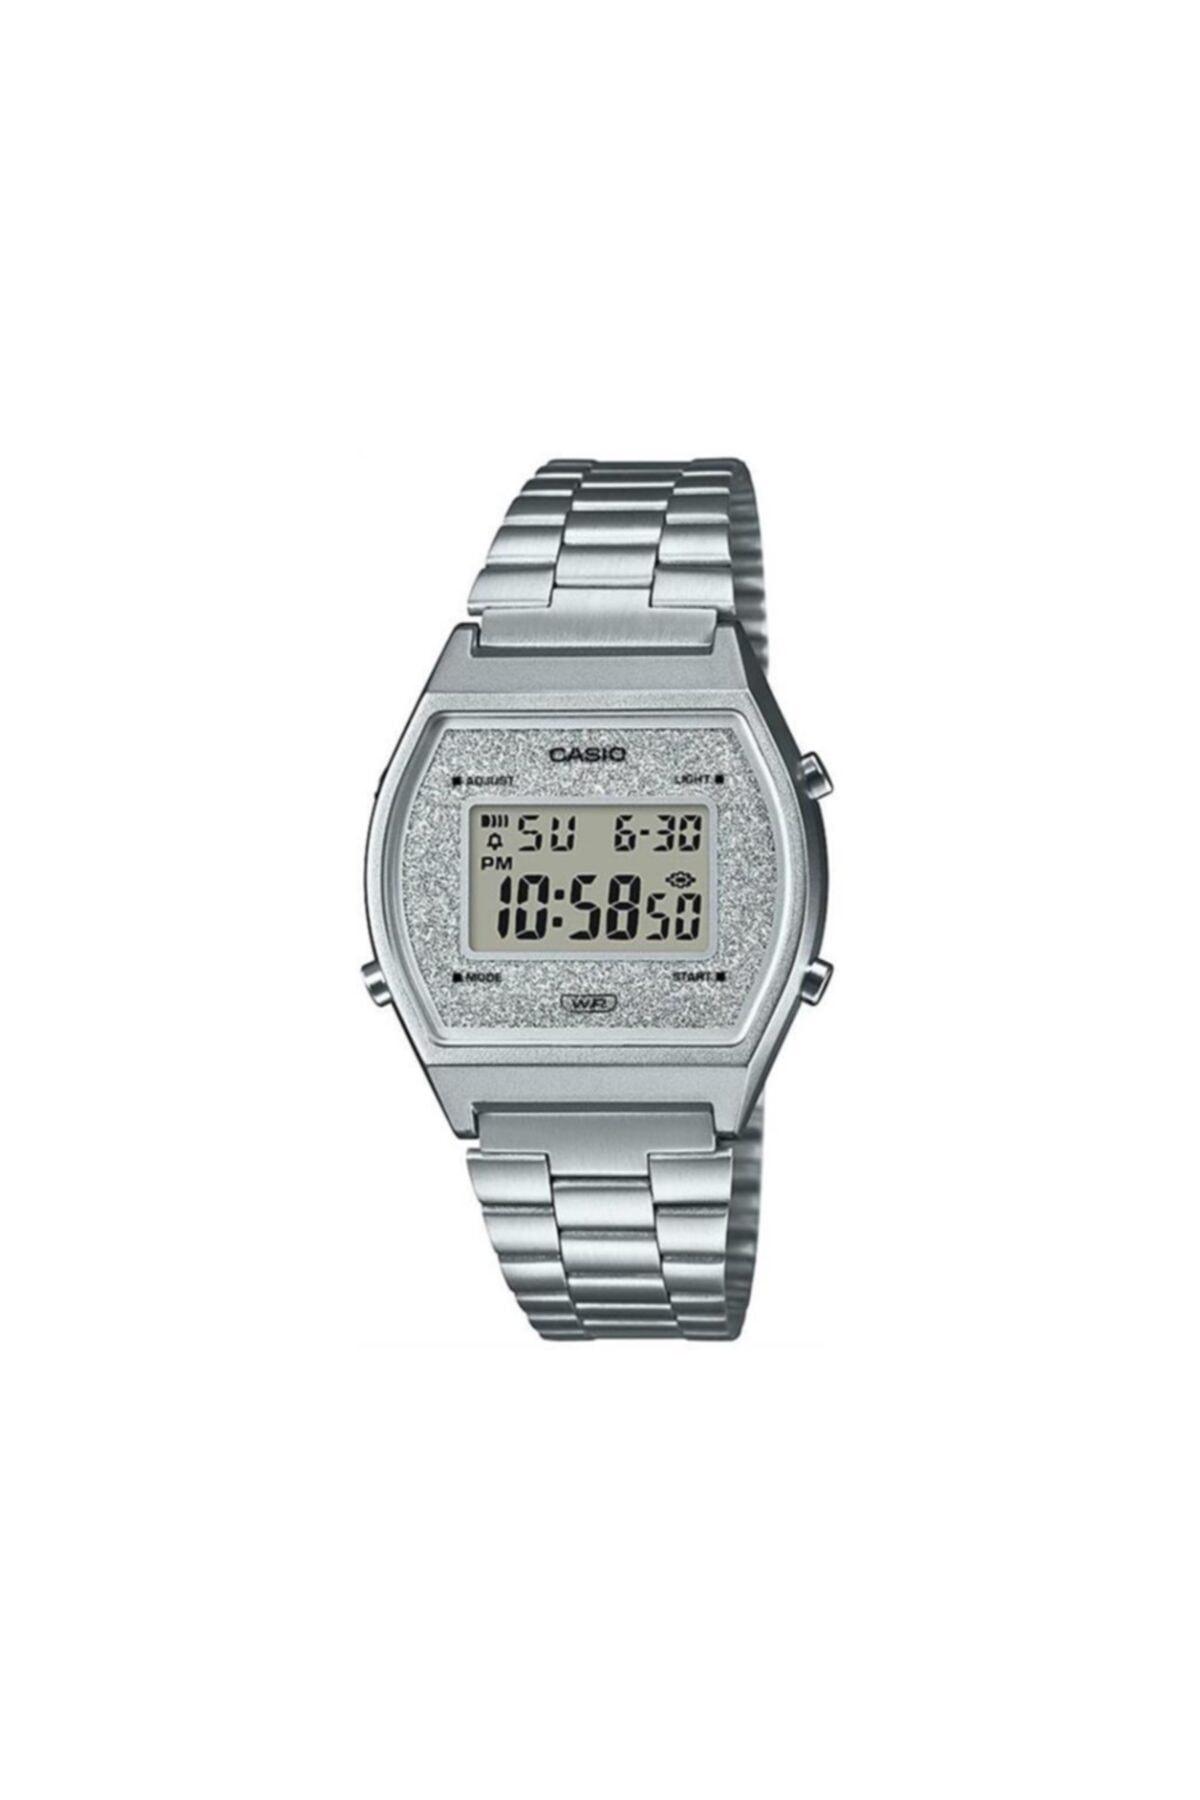 خرید پستی ساعت زنانه اصل برند کاسیو رنگ متالیک کد ty40995757